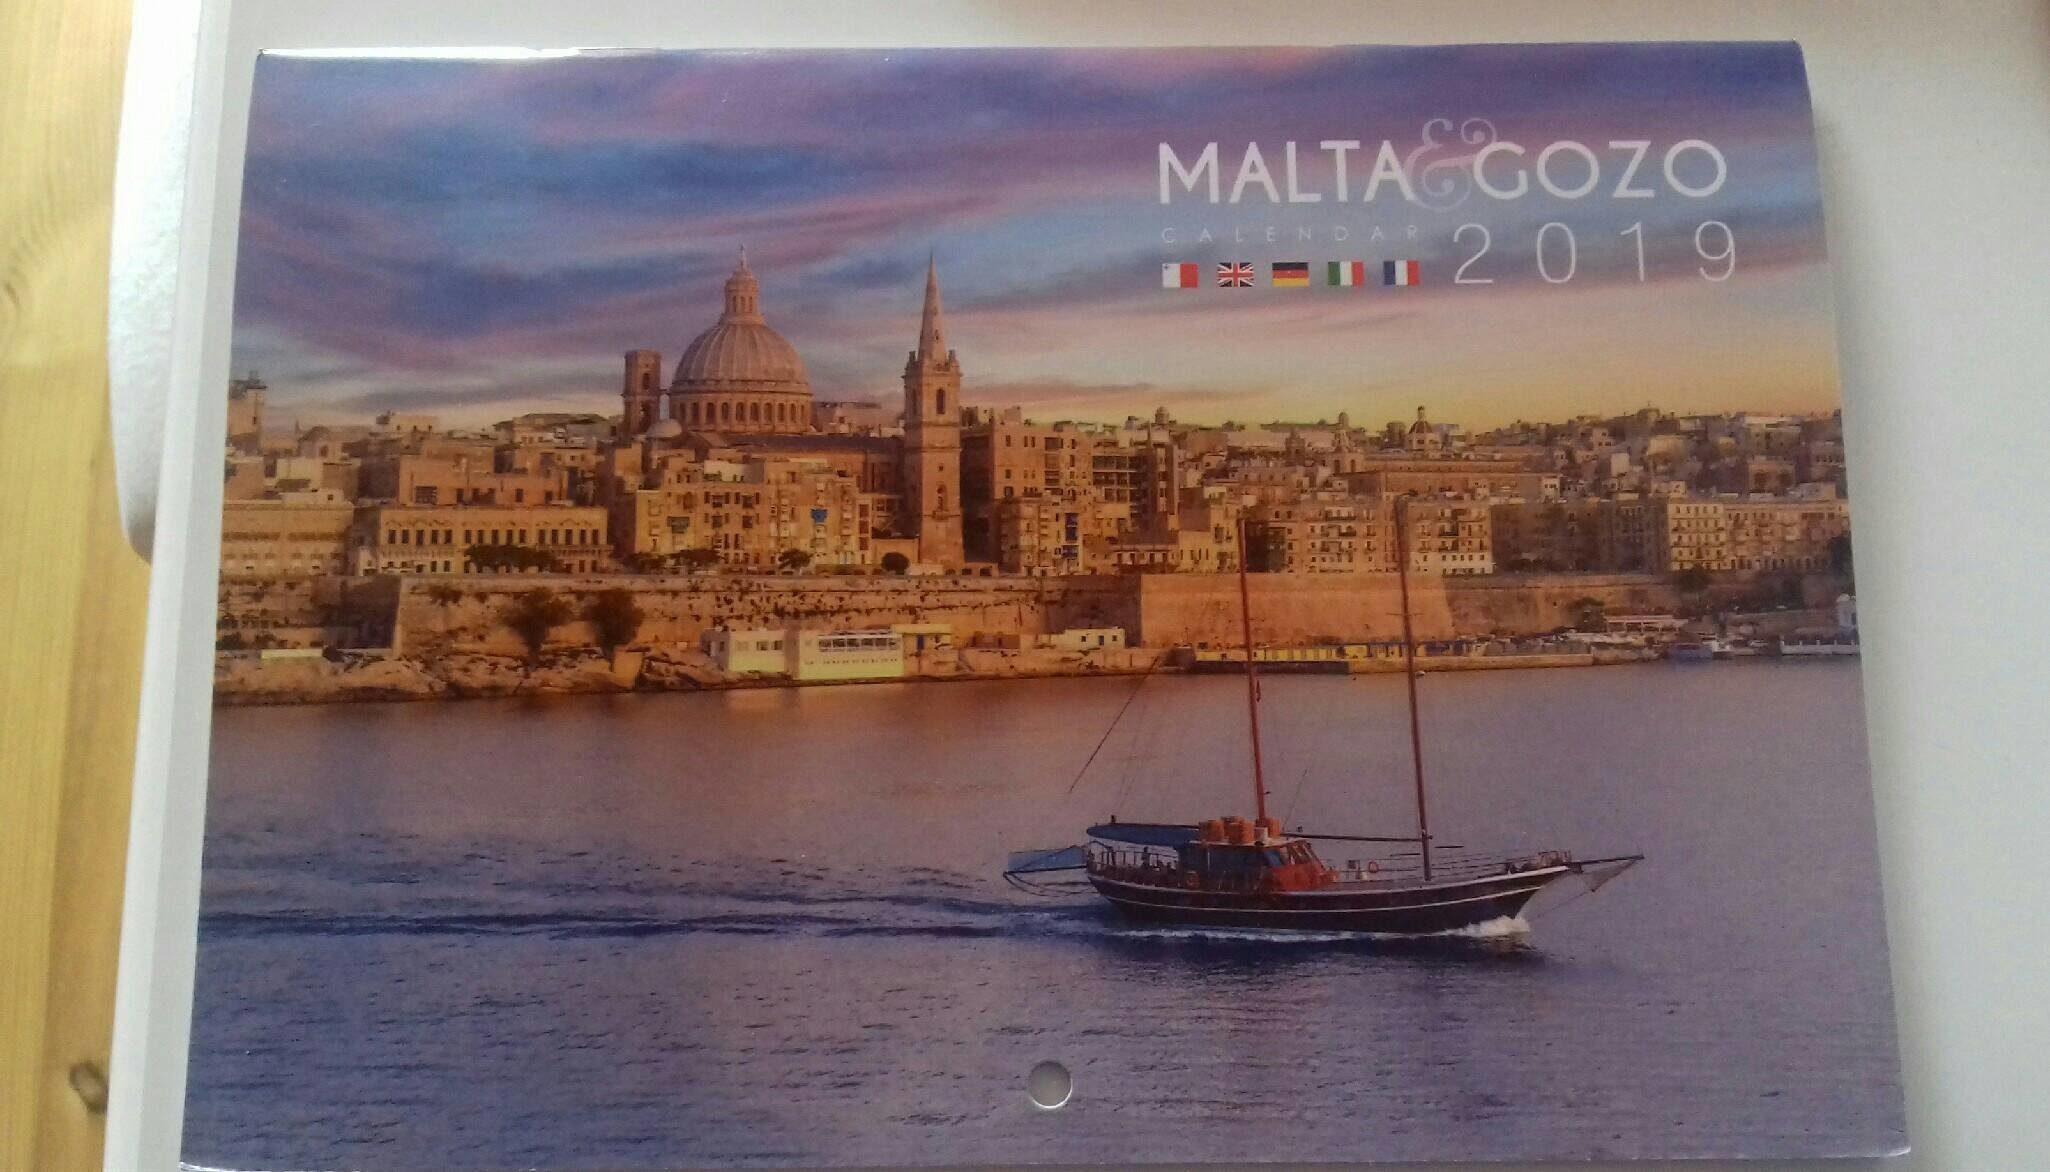 Malta & Gozo - Product